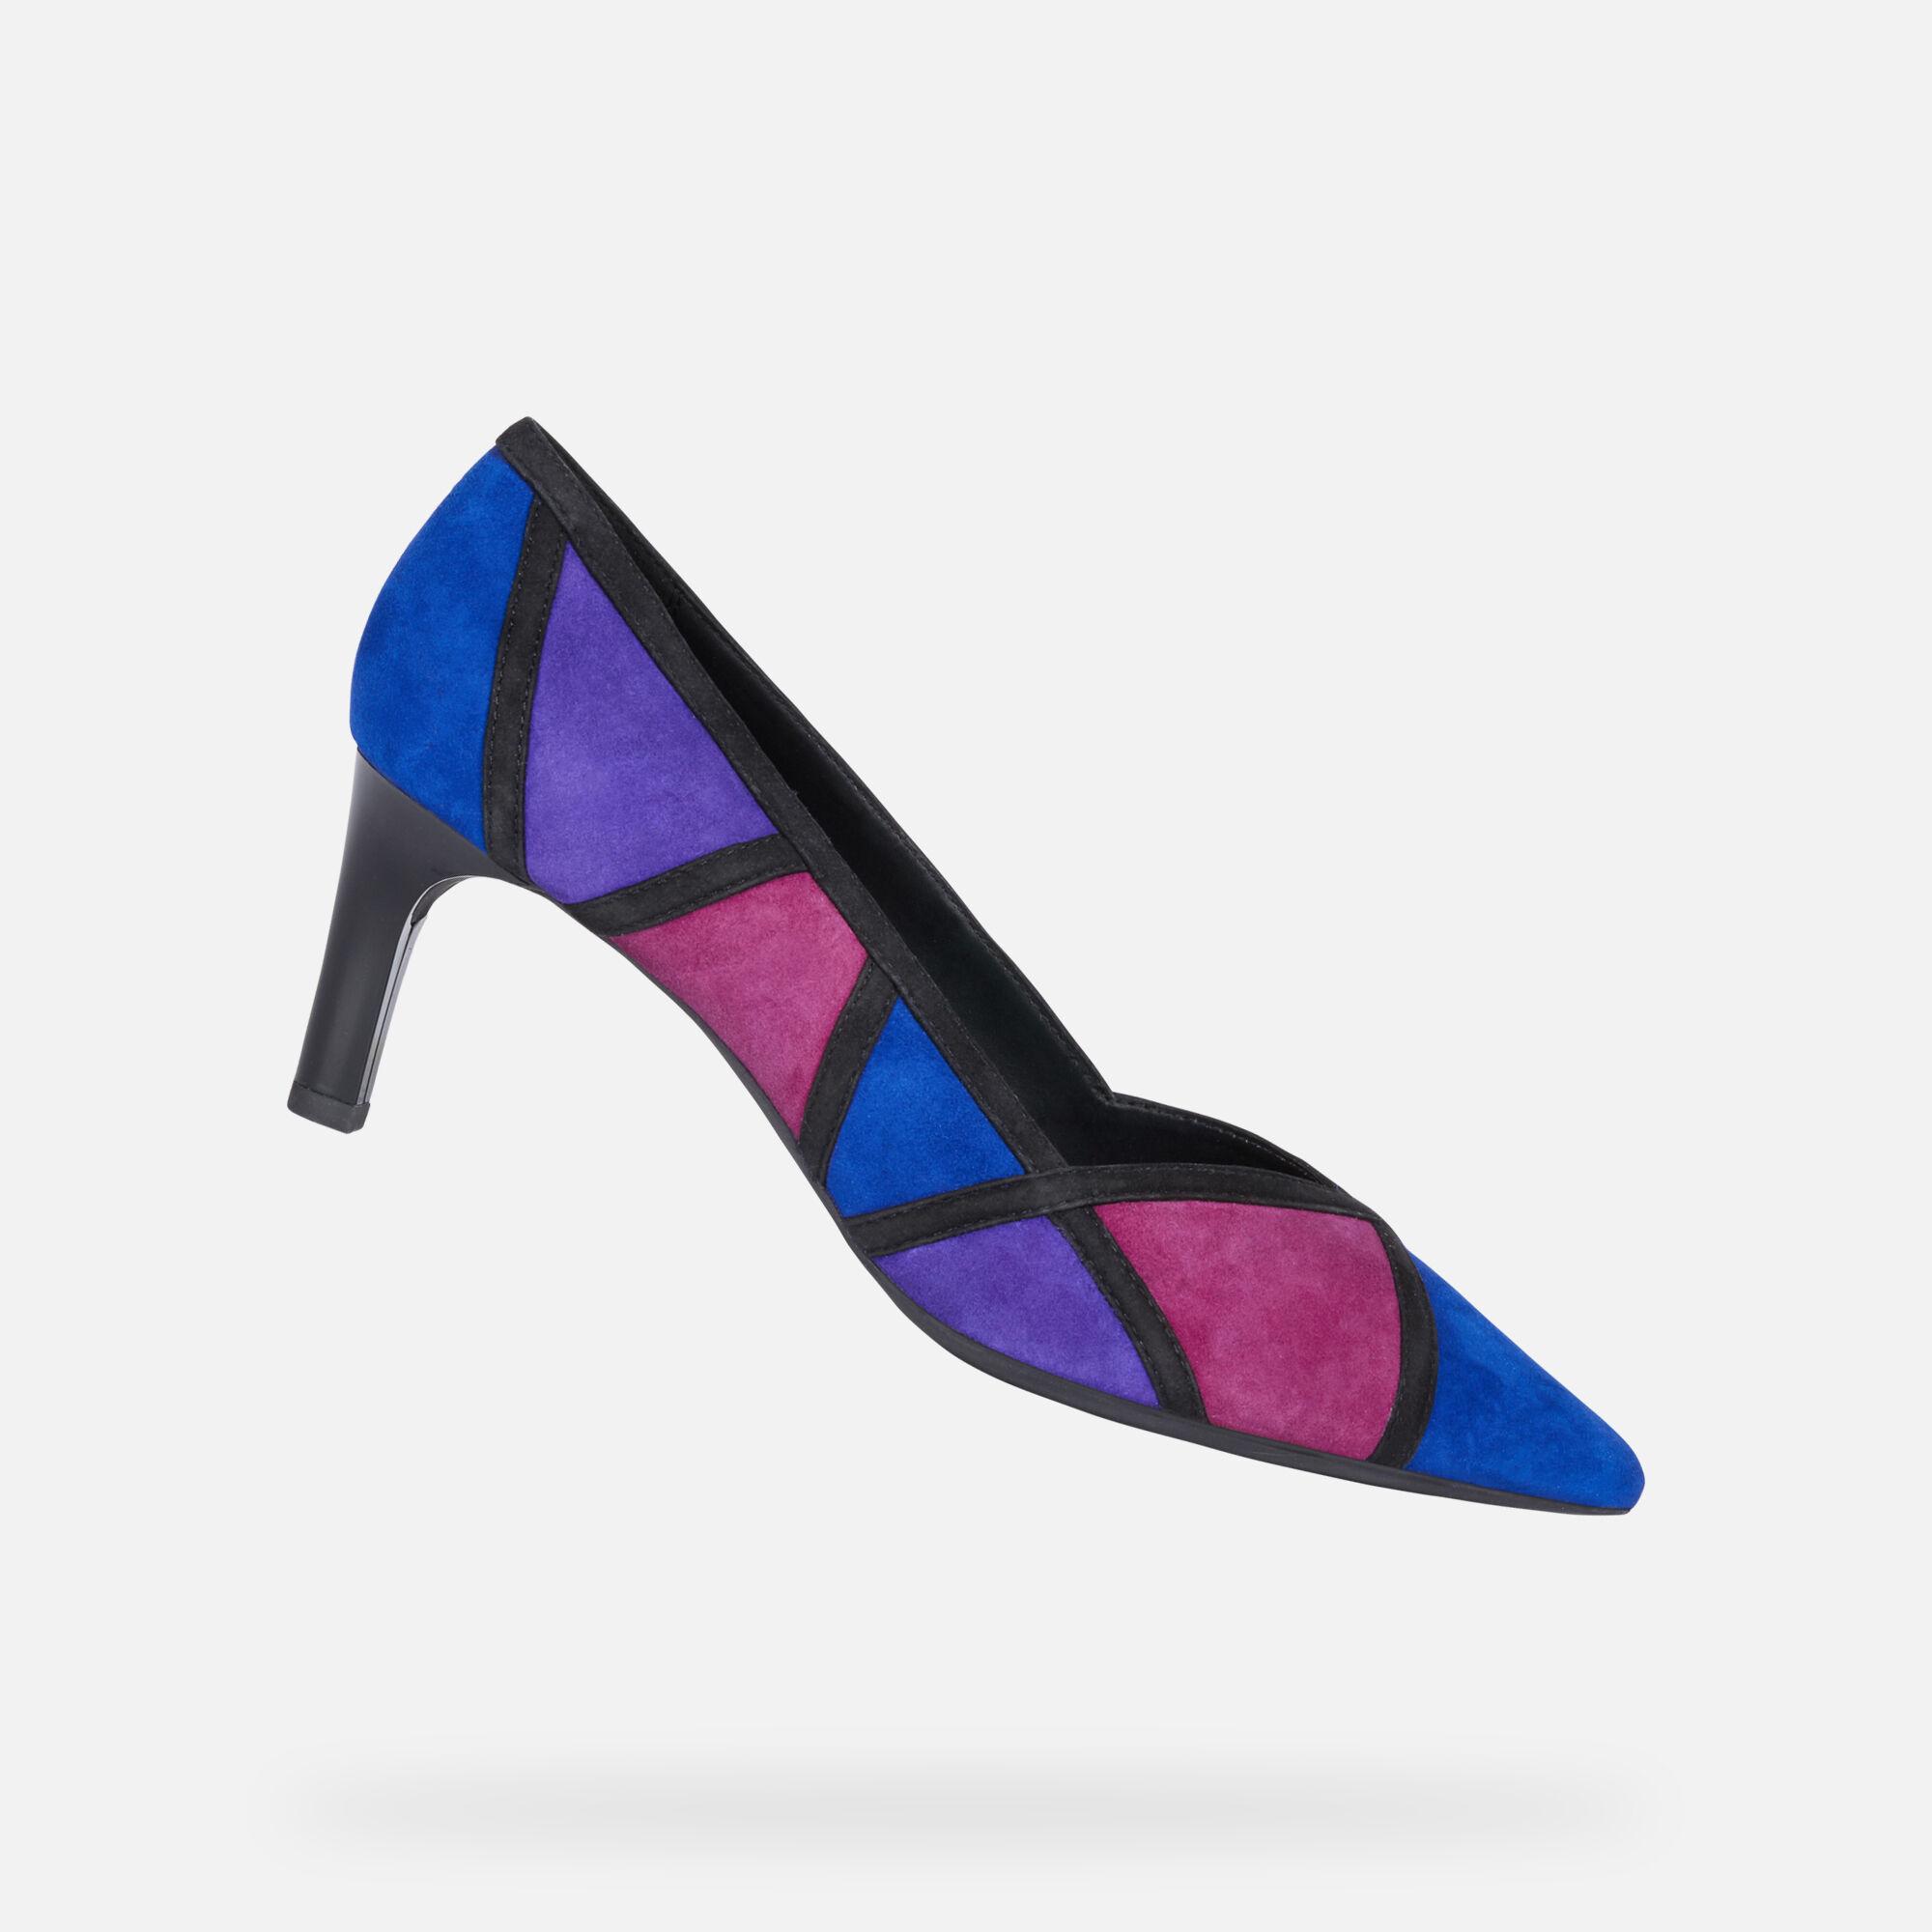 Geox BIBBIANA Femme Chaussures Bleue roi   Geox ® Store